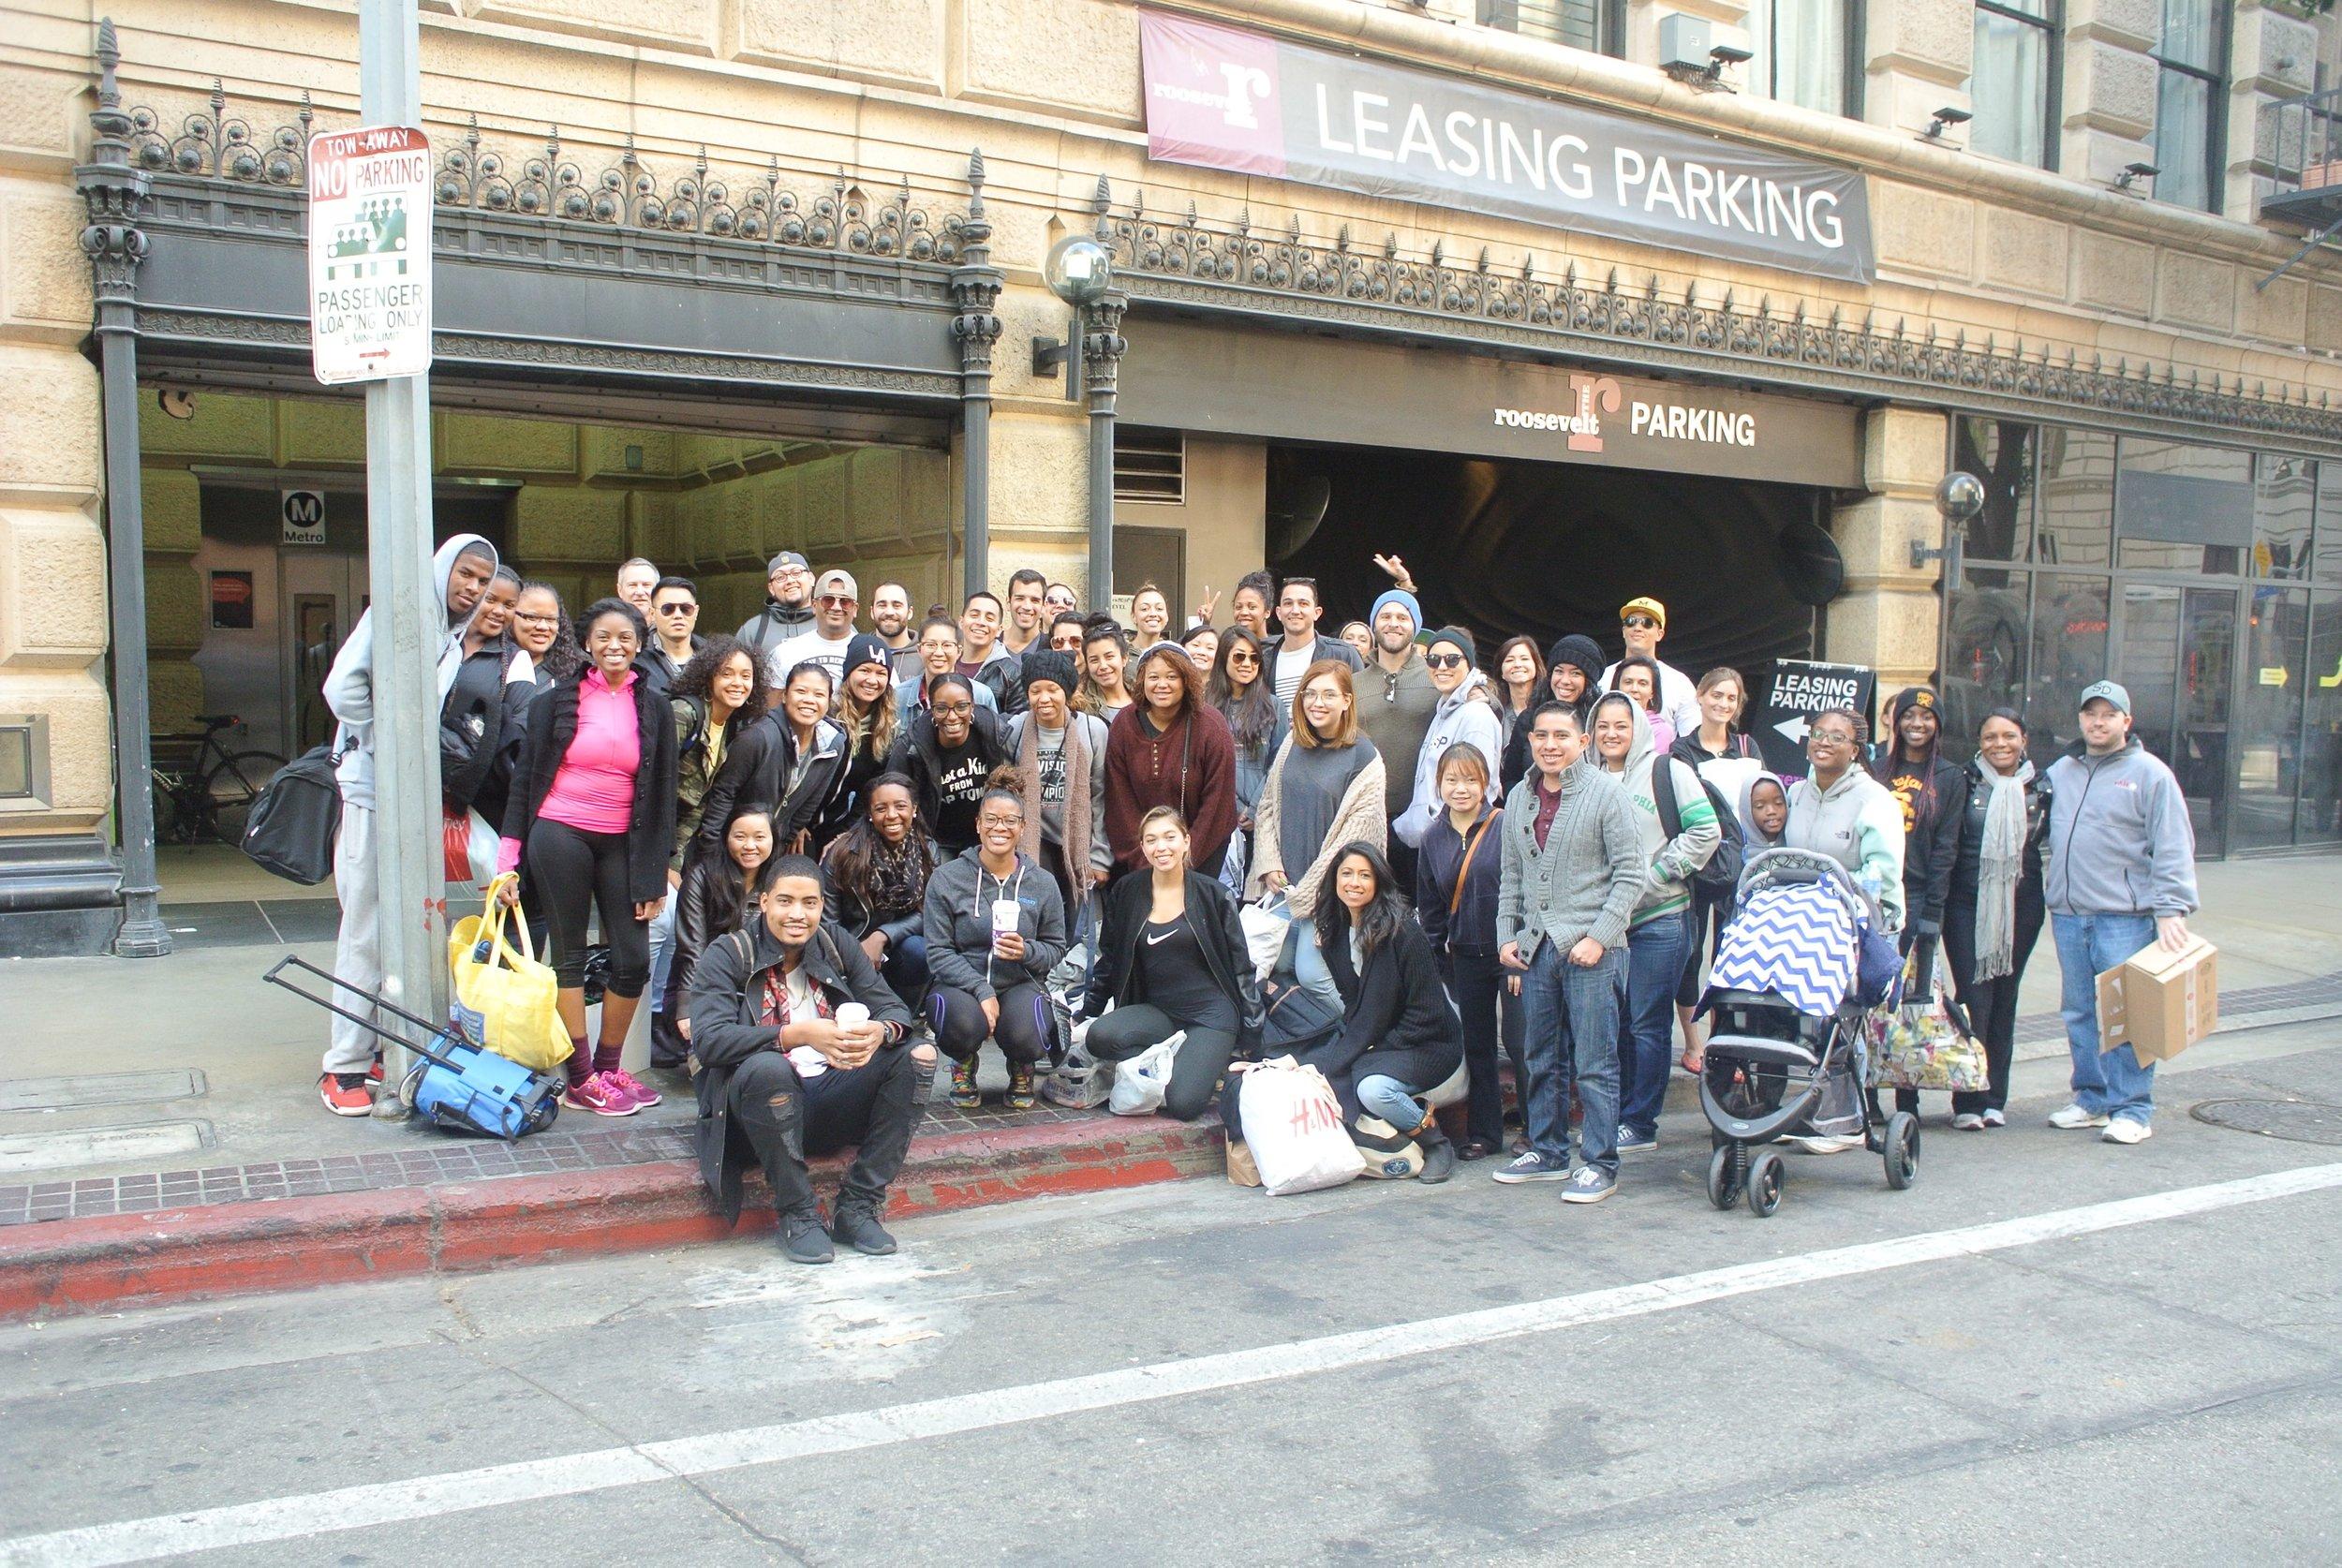 Socks4Souls Donation Drive Skid Row Los Angeles, CA 2015